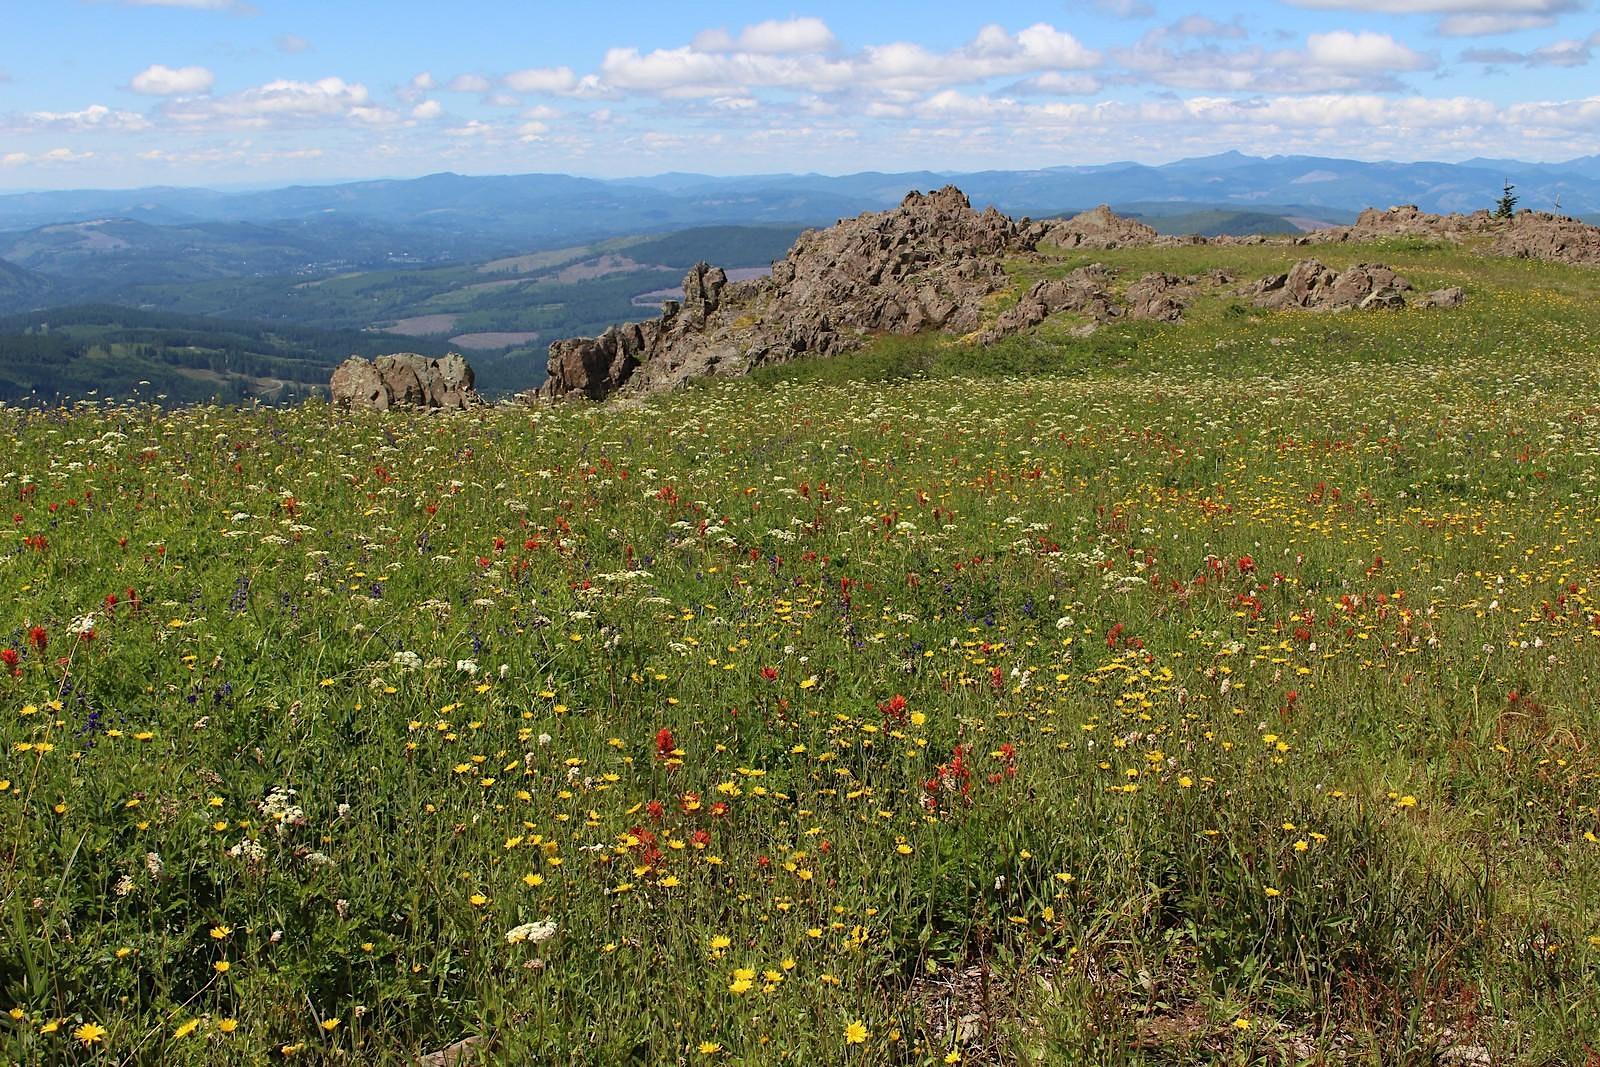 CANCELED: Silver Star Mountain & Ed's Trail, WA